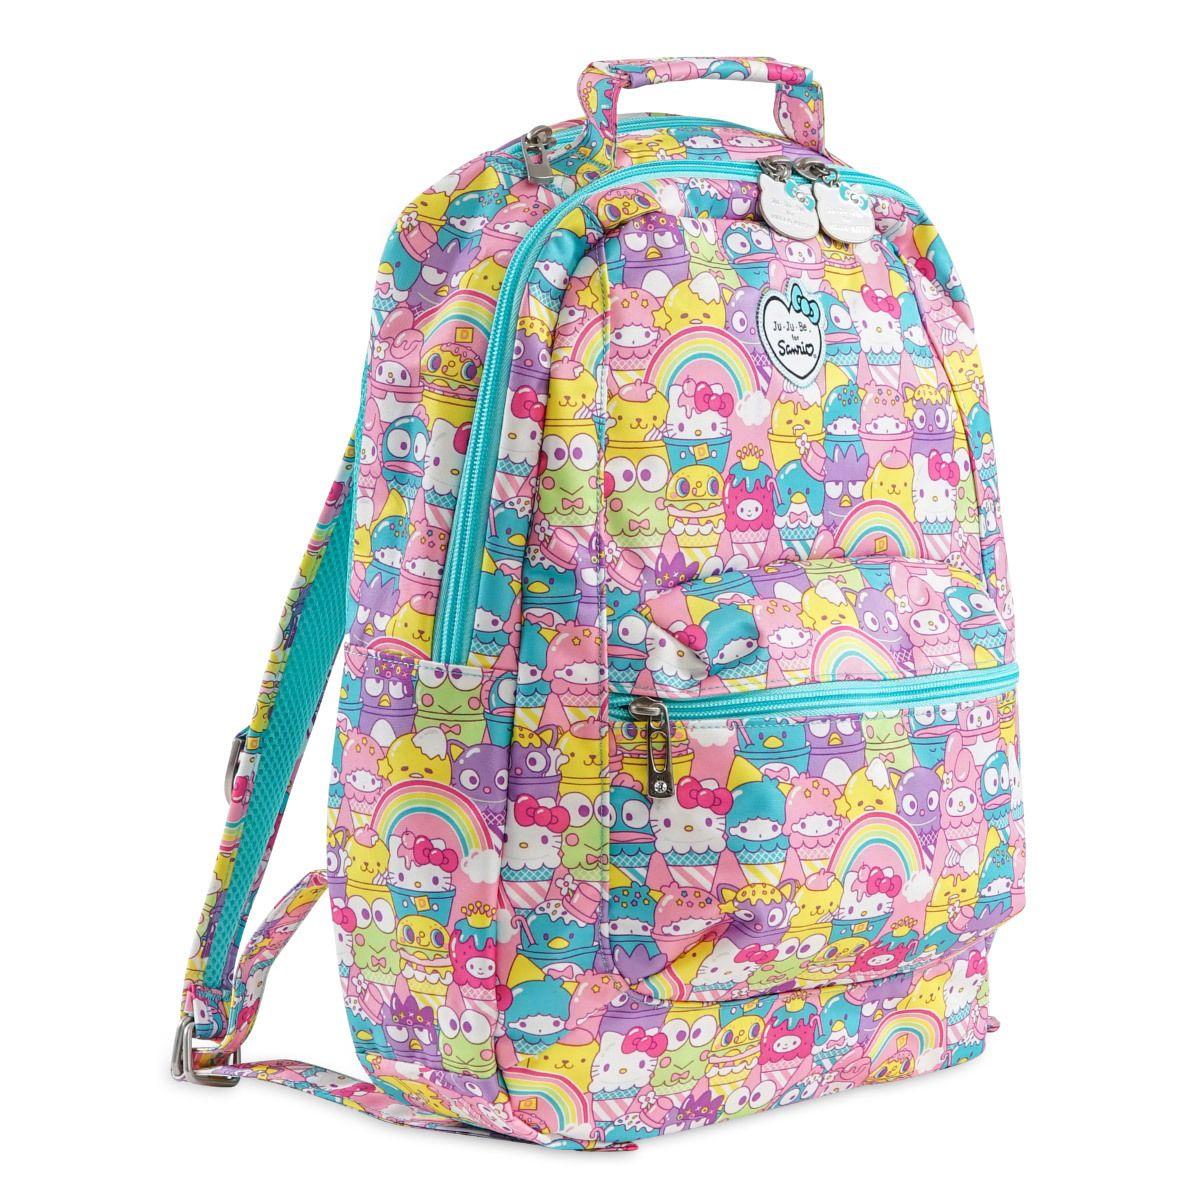 e40f05d9fe44 Be Packed - Hello Sanrio Sweets - Shop Ju-Ju-Be